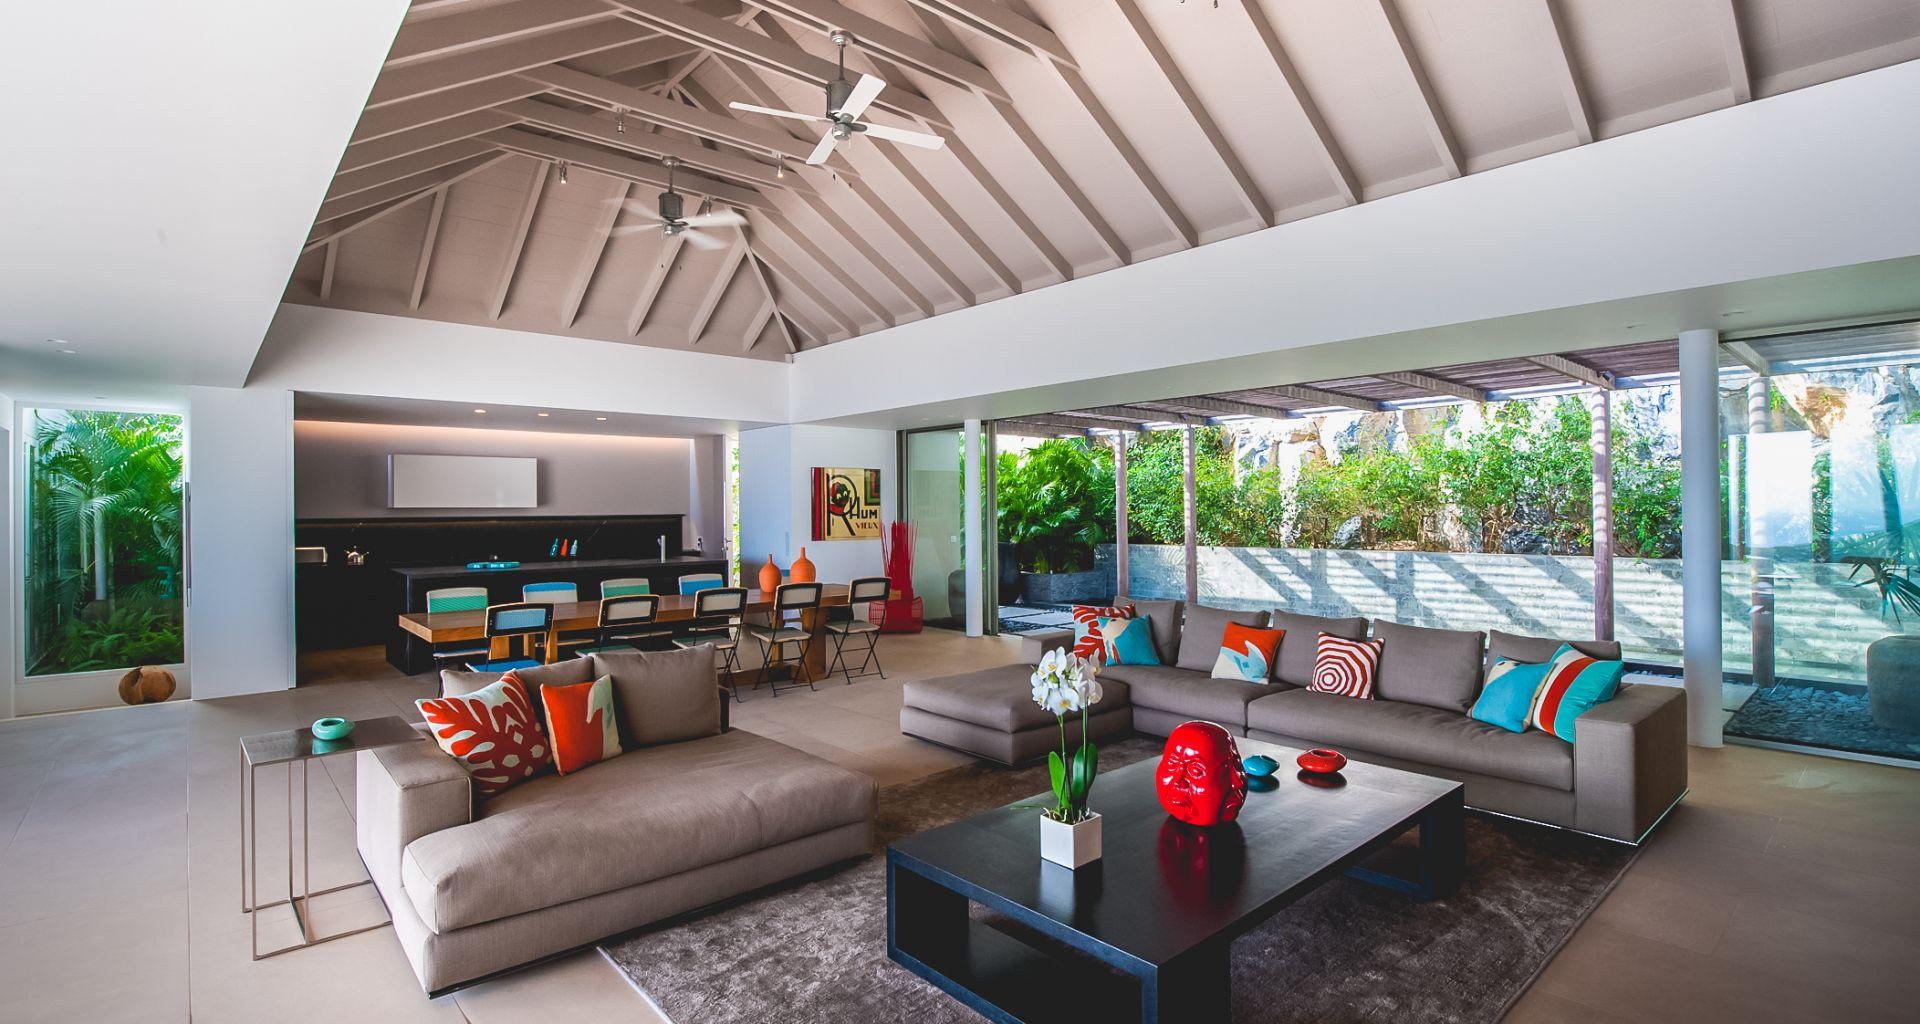 Villa Lina, St-Barts, Caribbean